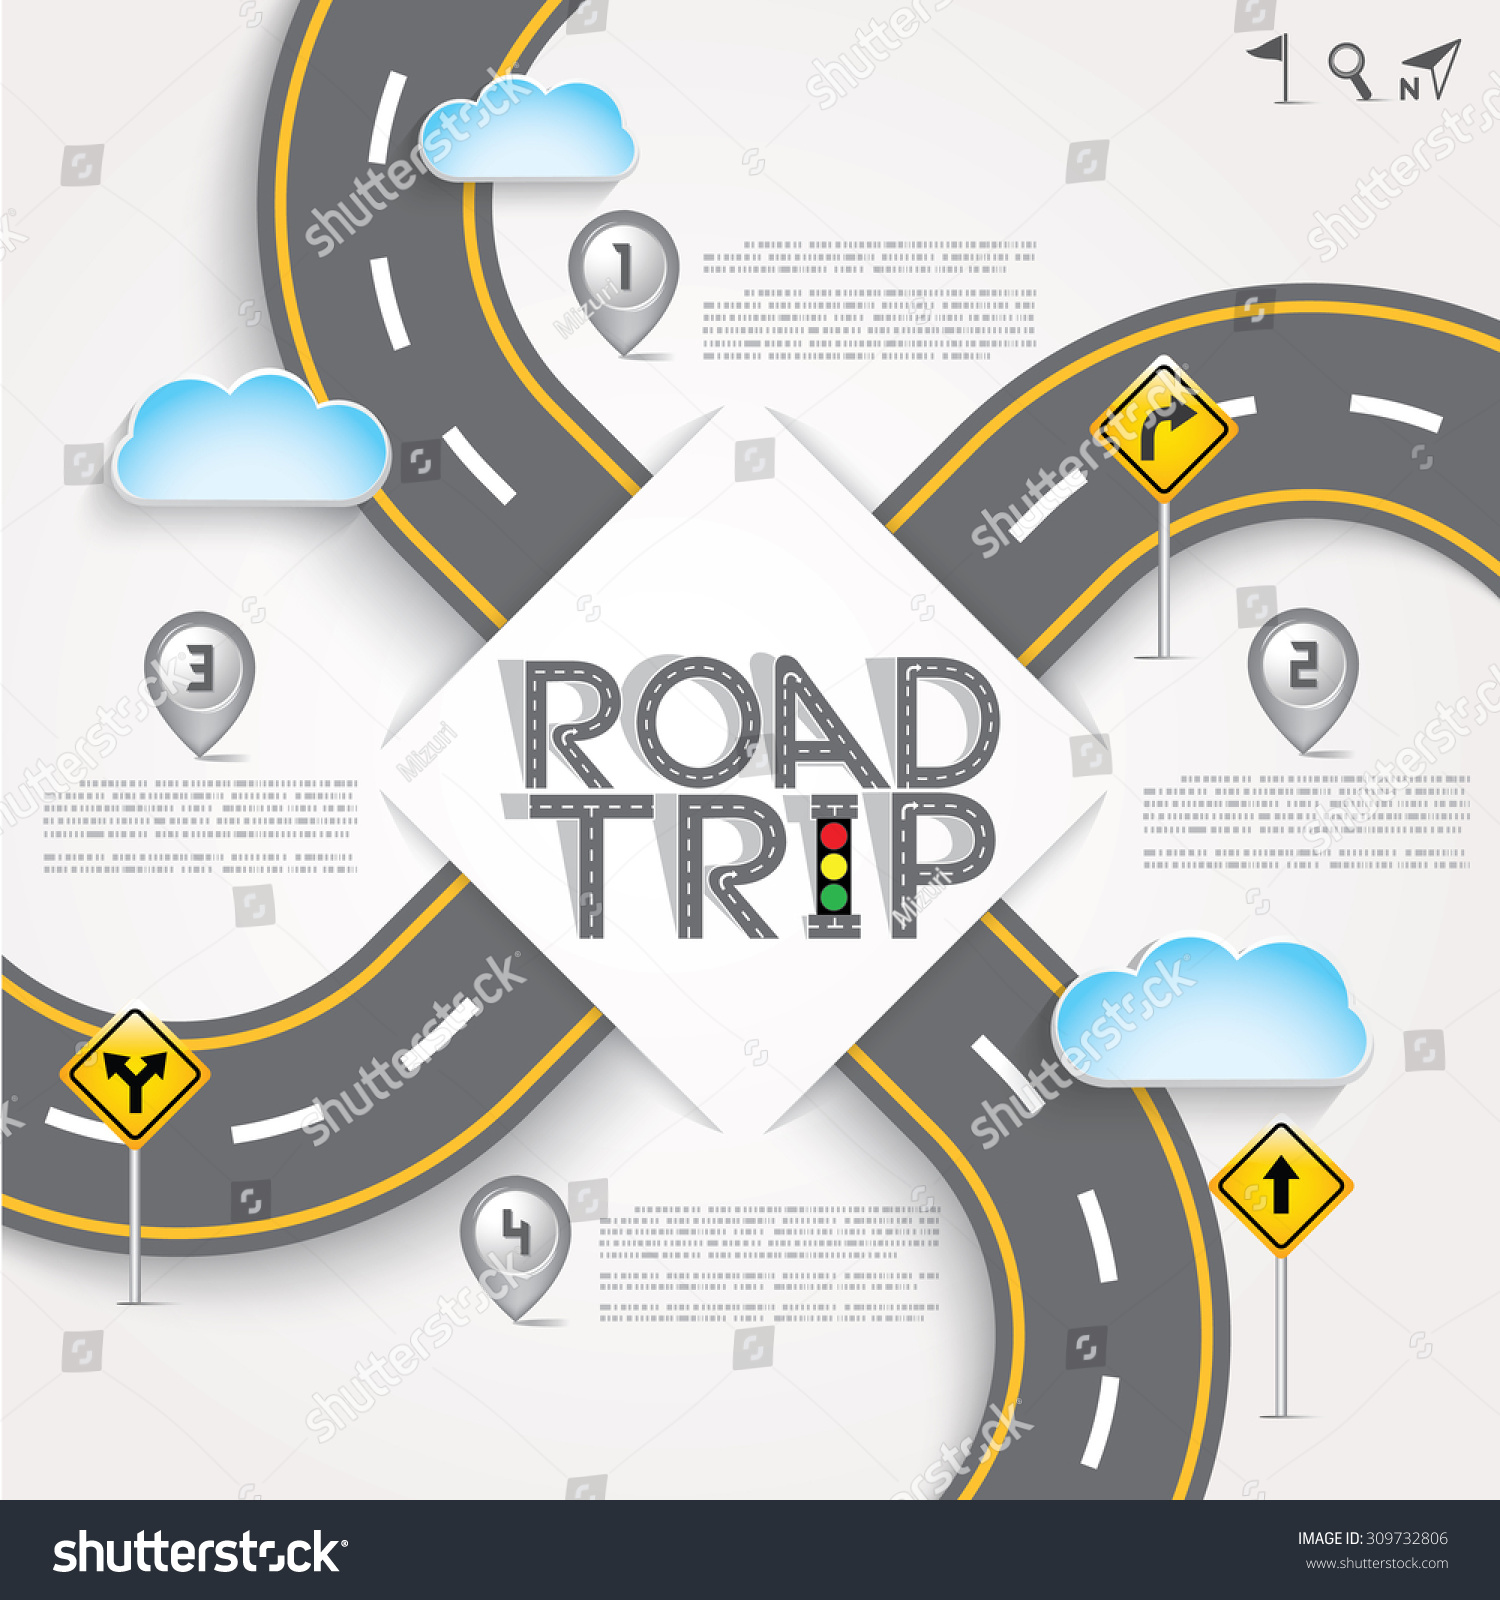 design road street template background words のベクター画像素材